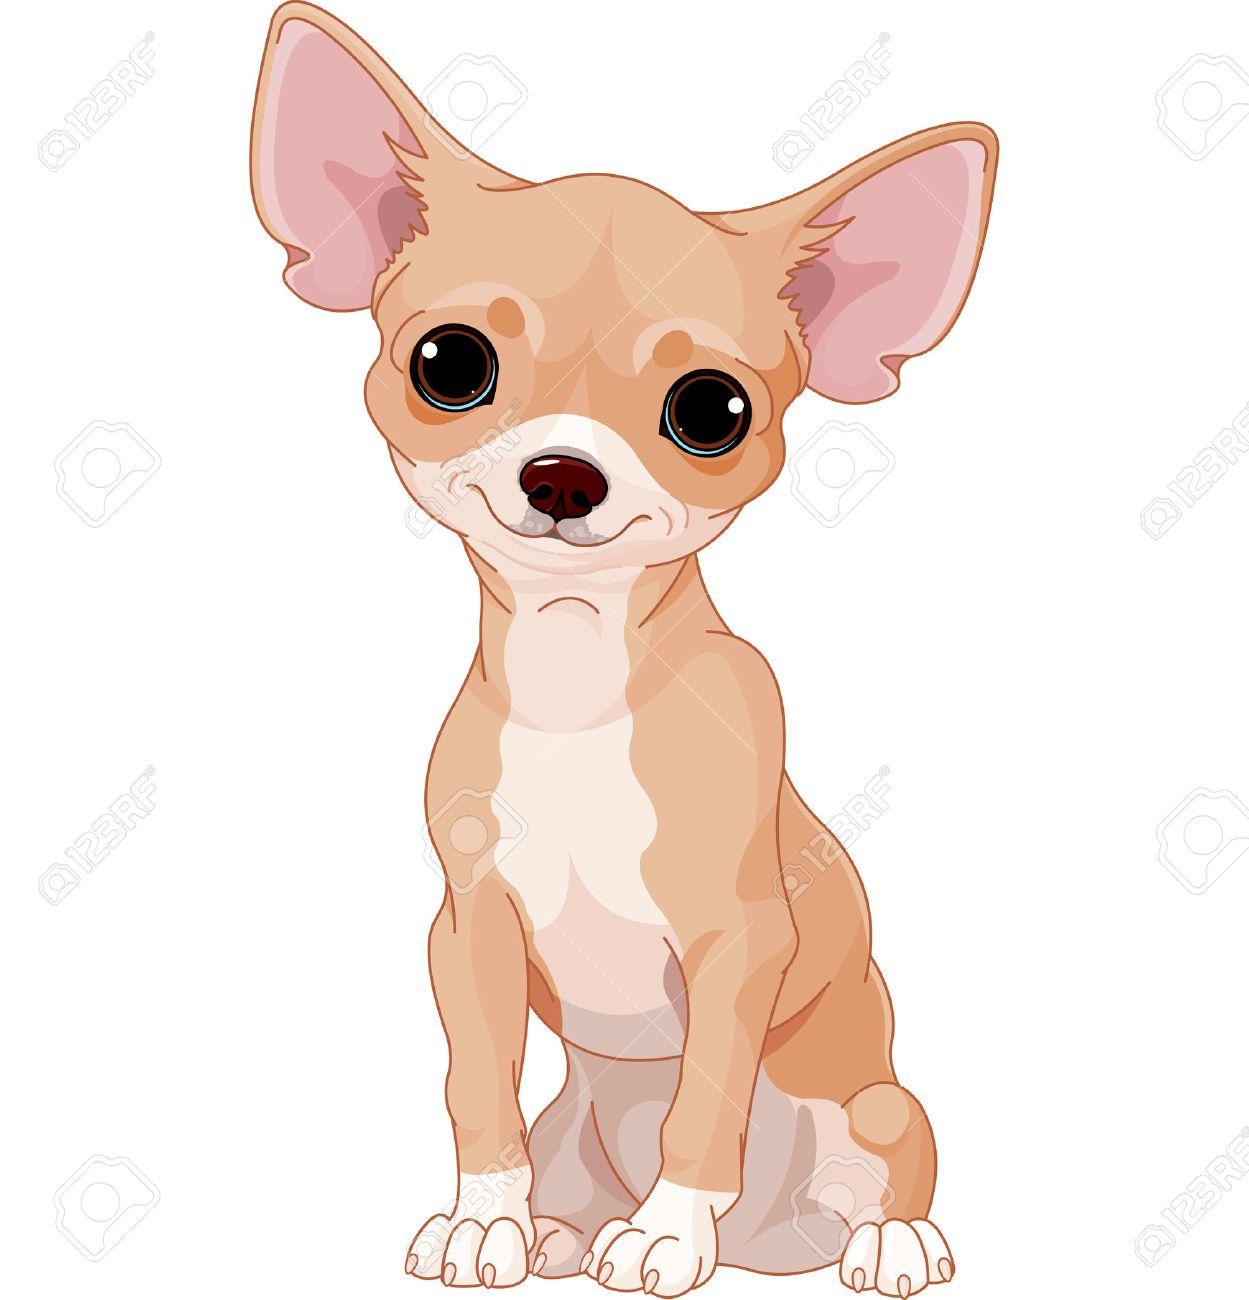 Popular Chihuahua Canine Adorable Dog - 29168236-cute-dog-of-breed-chihuahua  Image_2661  .jpg